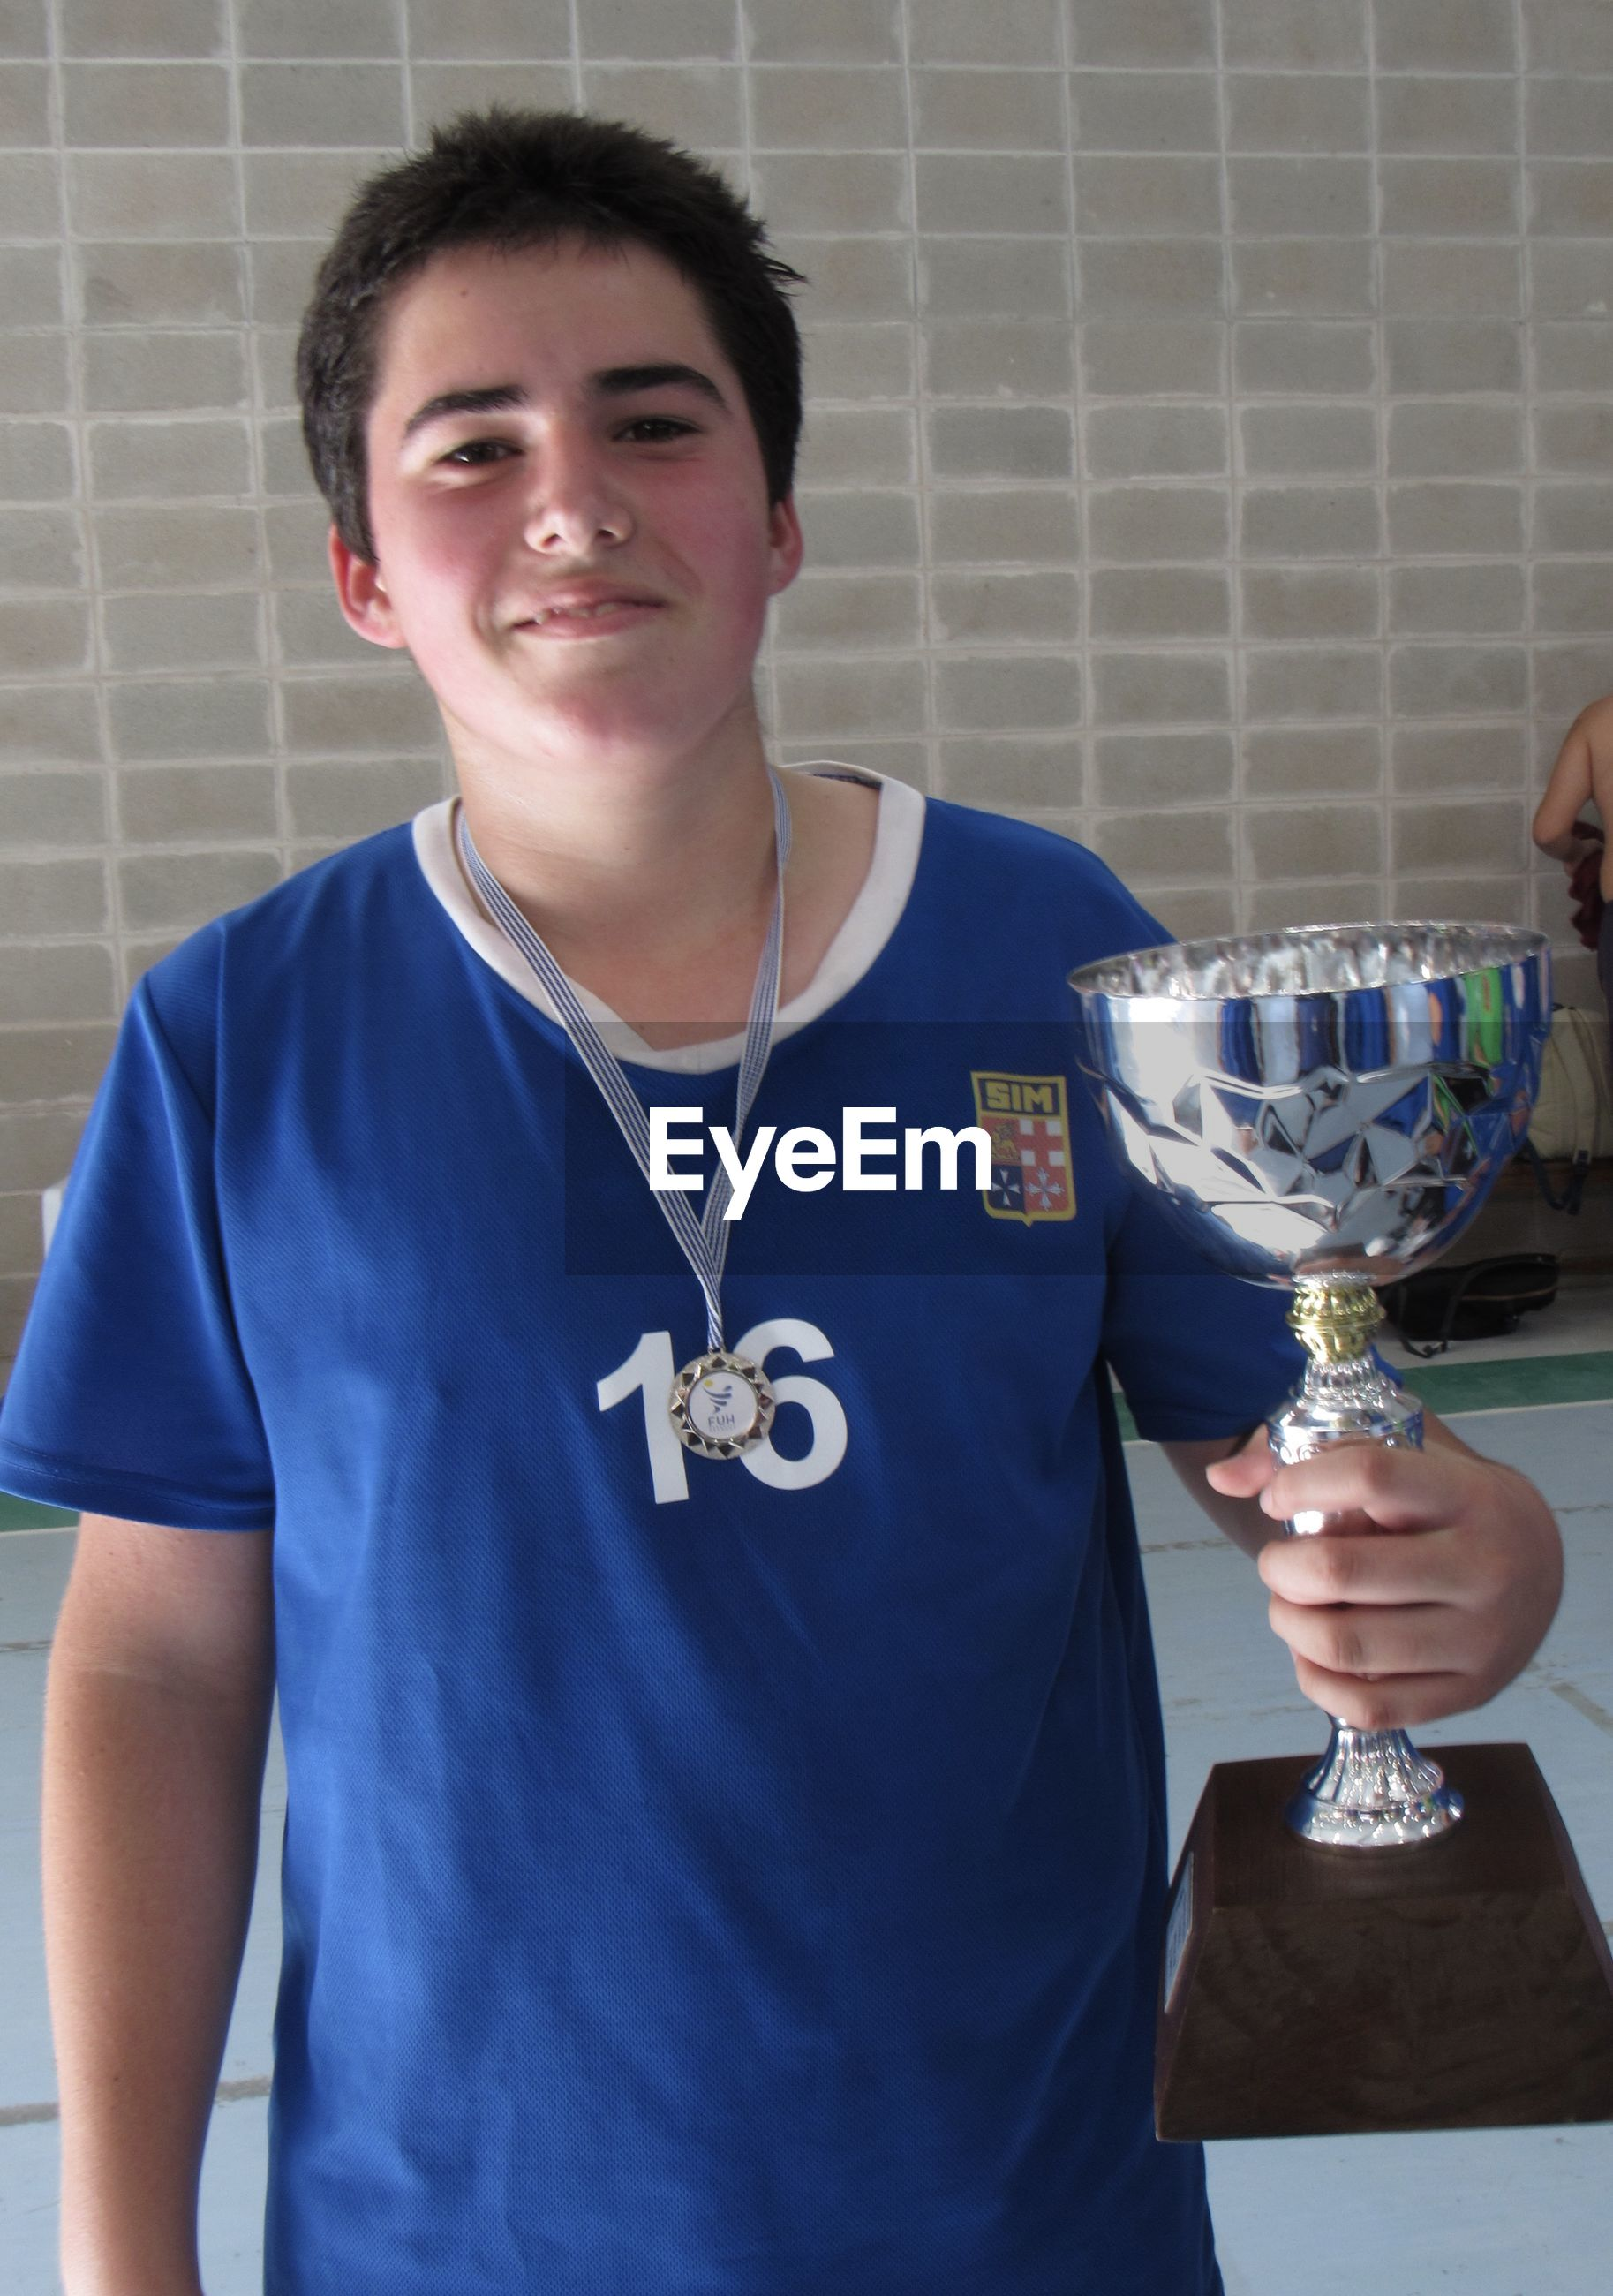 Portrait of smiling boy holding trophy